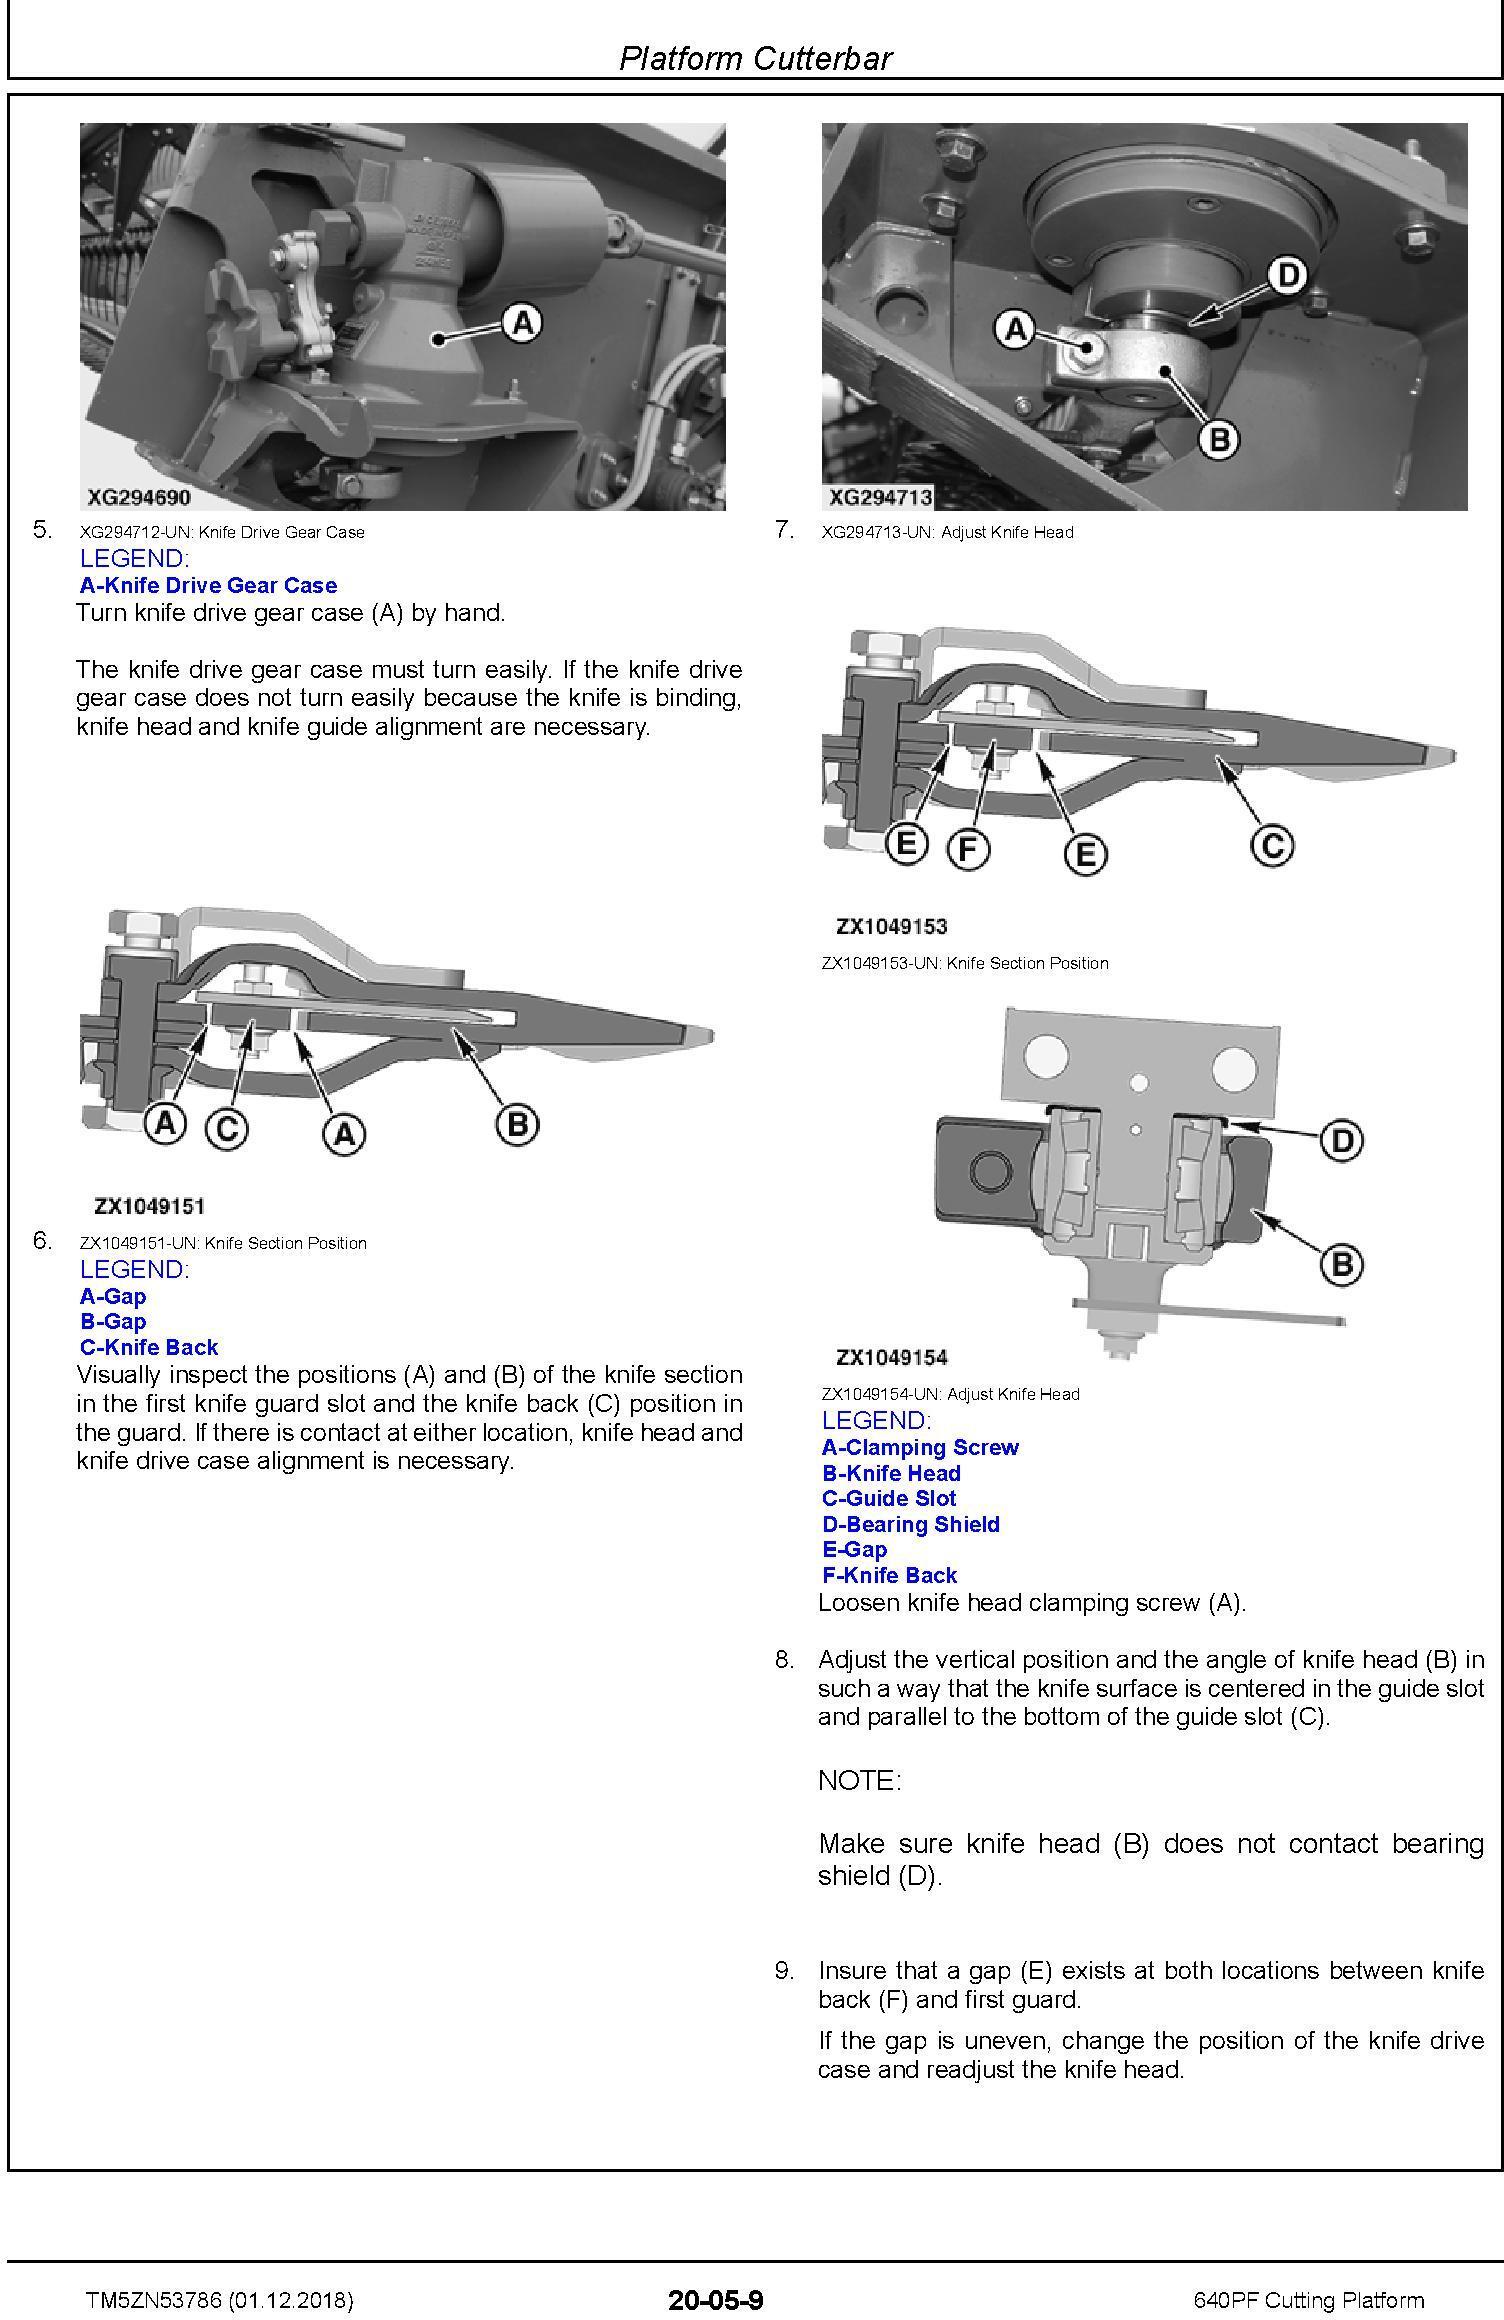 John Deere 640PF Cutting Platform Technical Service Manual (TM5ZN53786) - 2